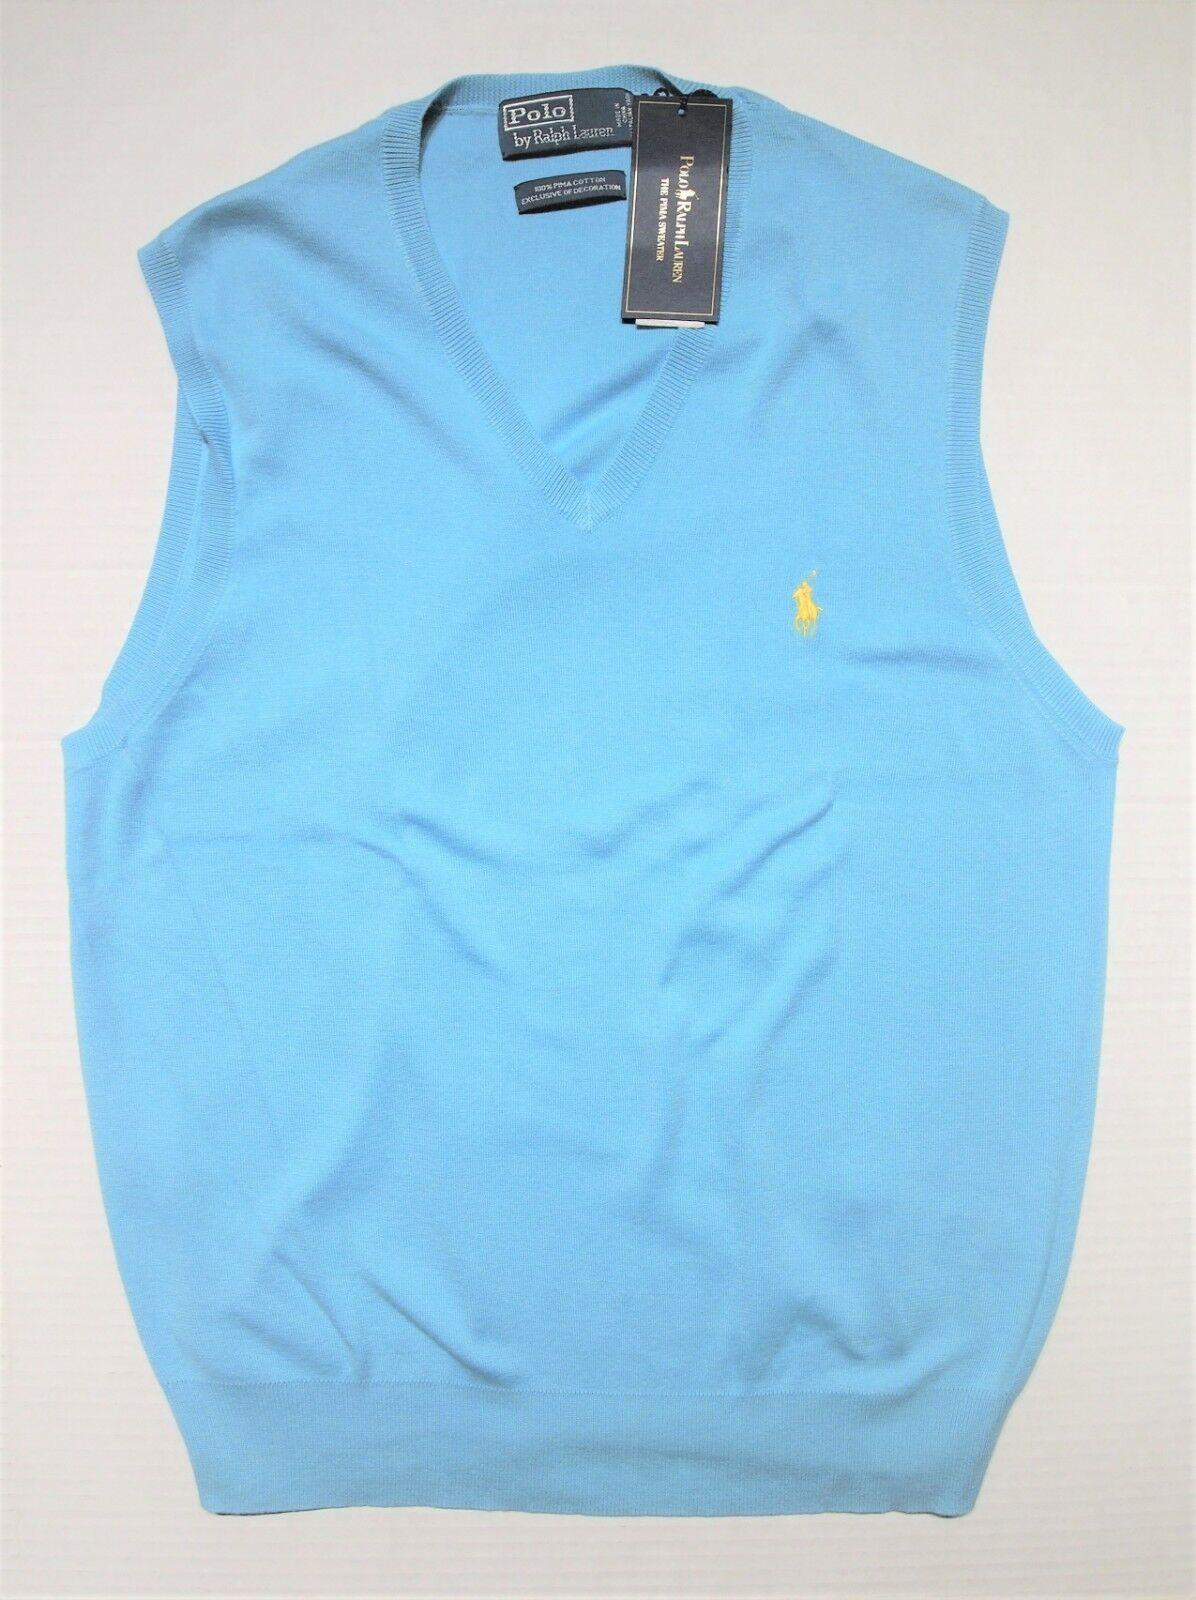 Polo Ralph Lauren mens pullover sweater vest size large image 4